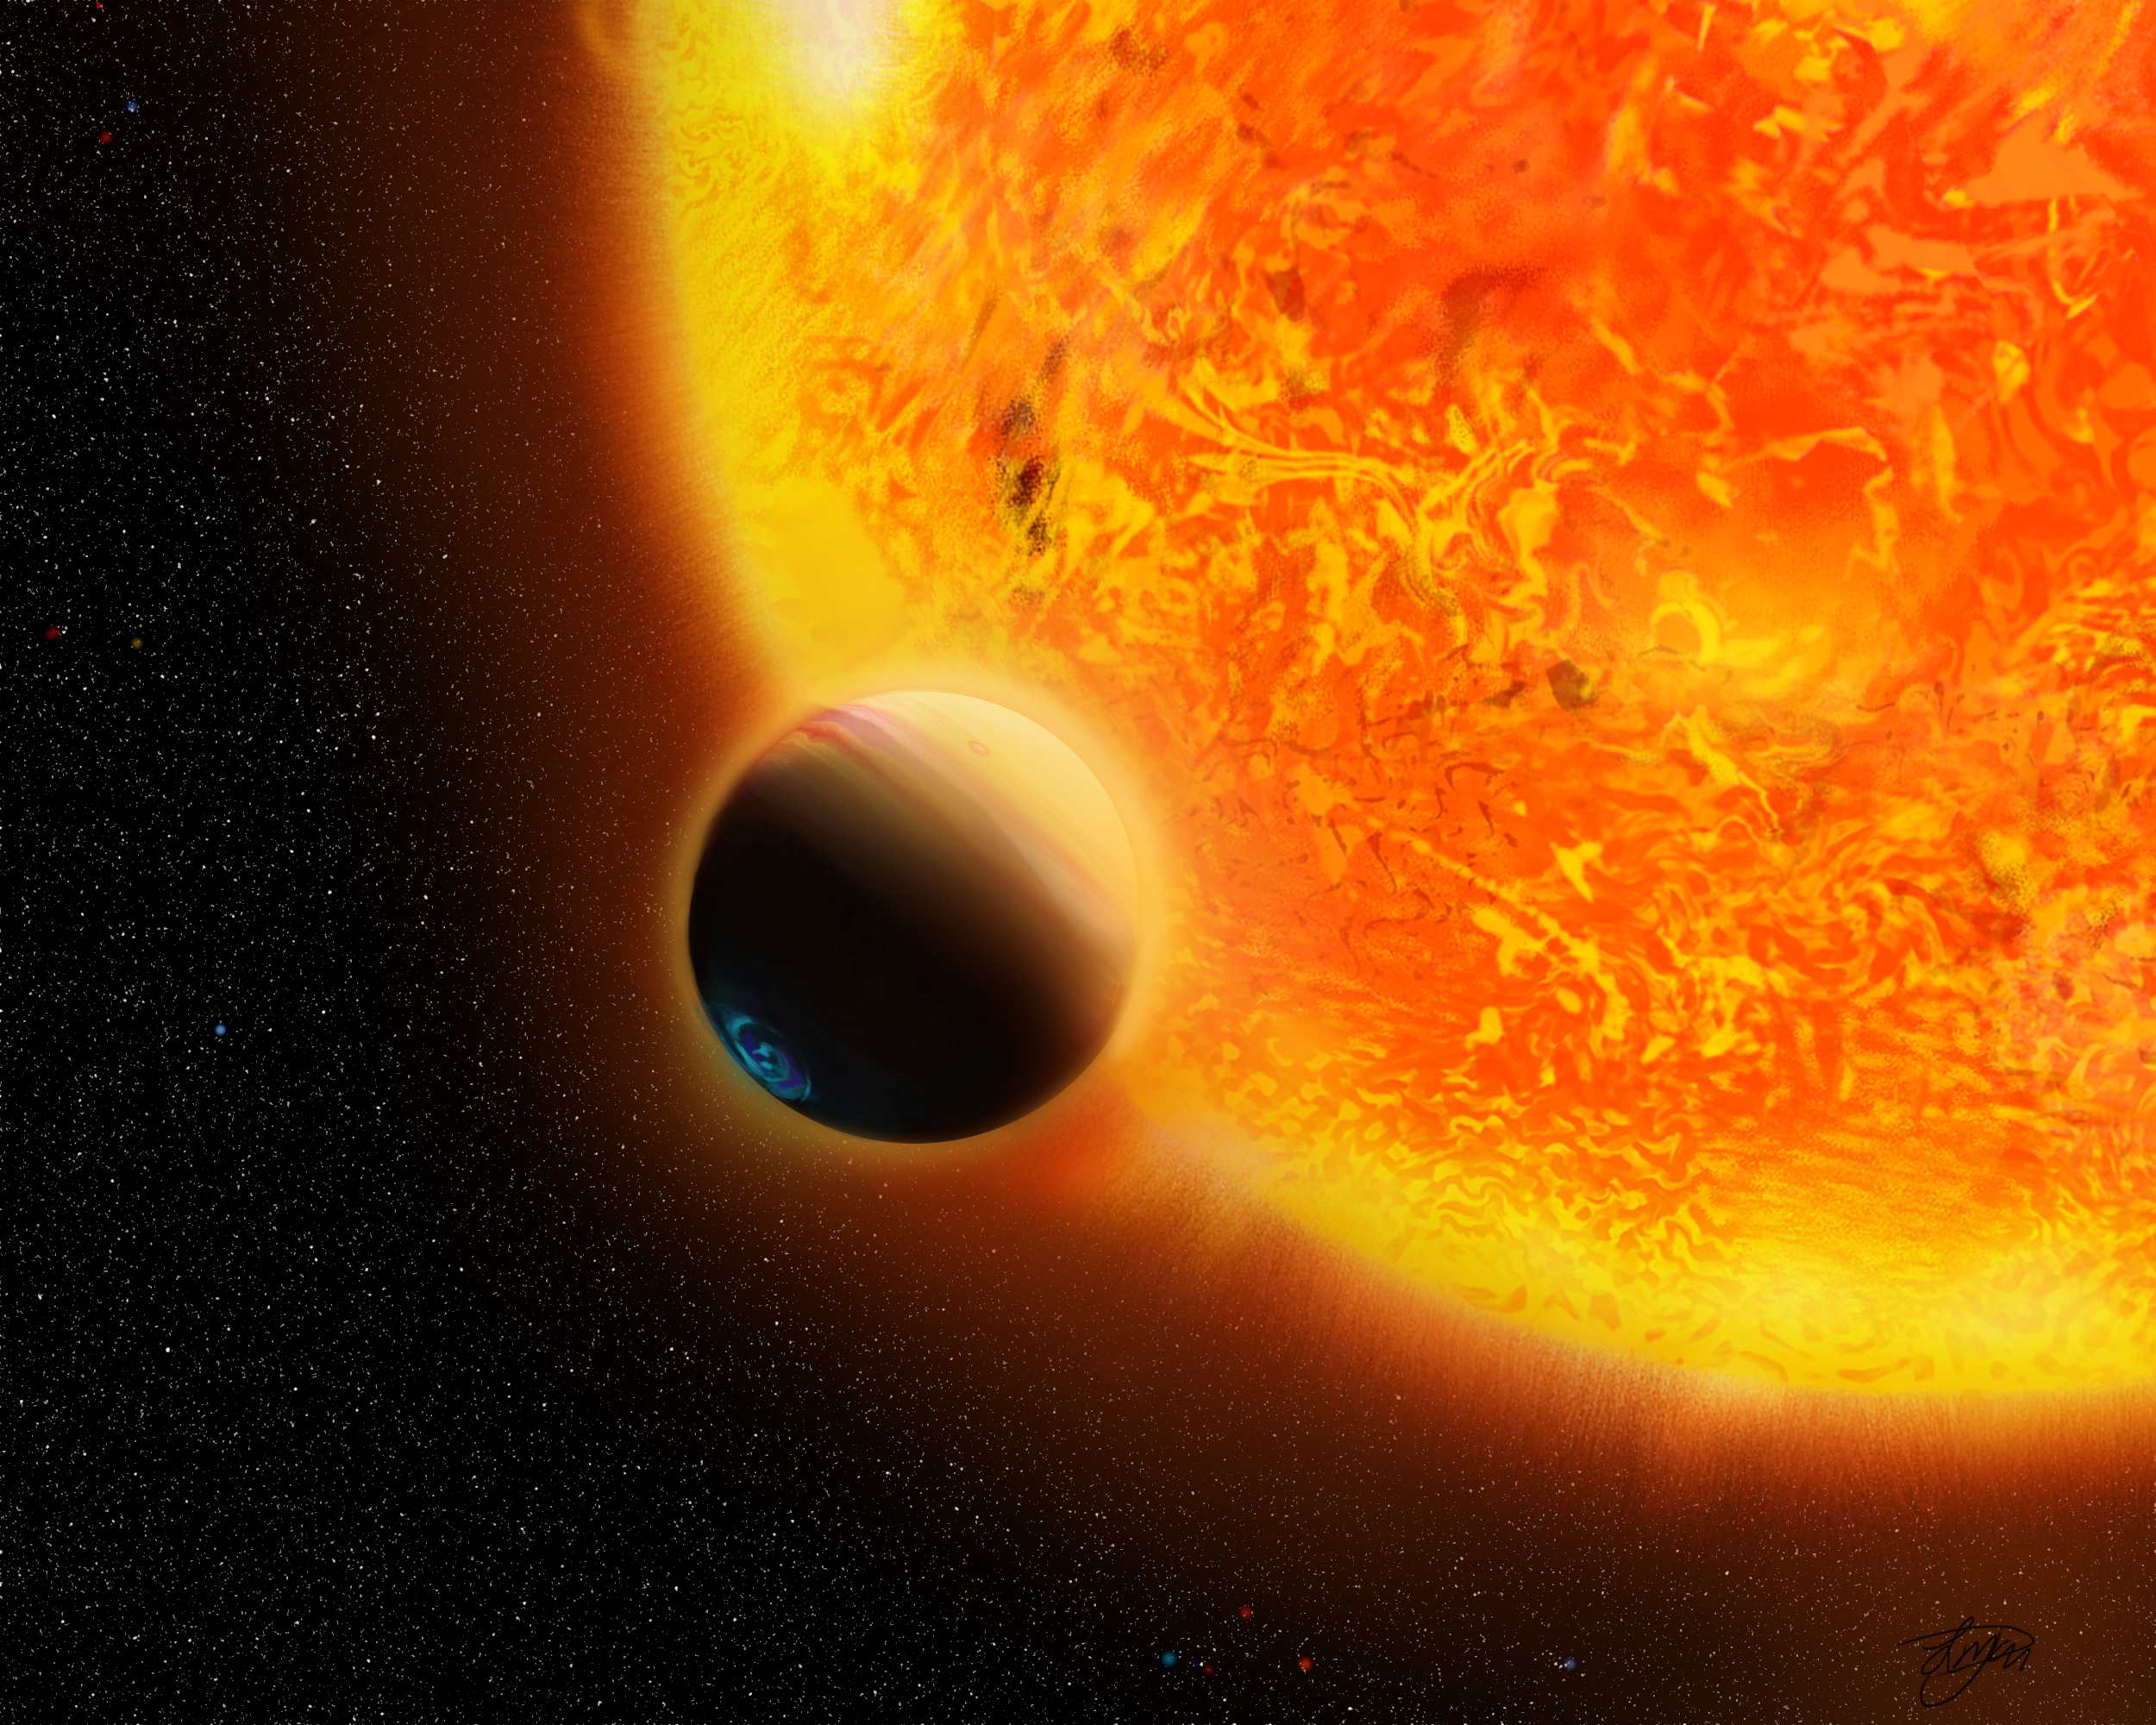 exoplaneet HAT-P-6b